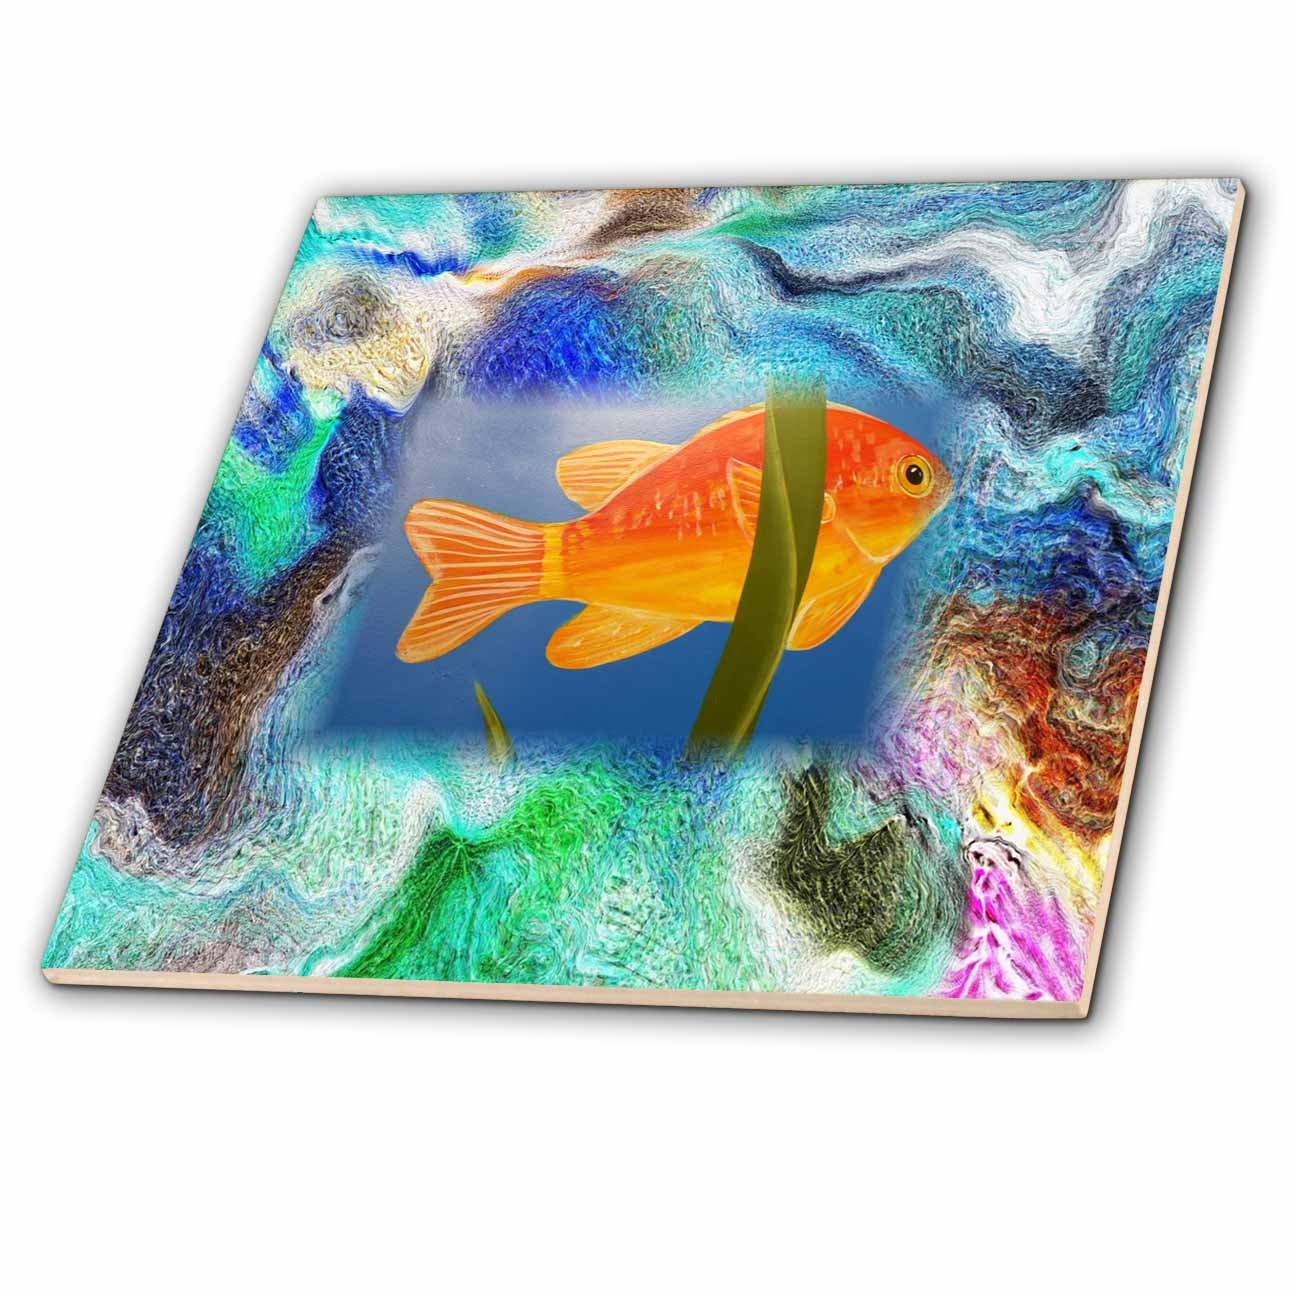 3dRose ct_281539_2 Image of Digital Painting with Orange Fish Ceramic Tiles,